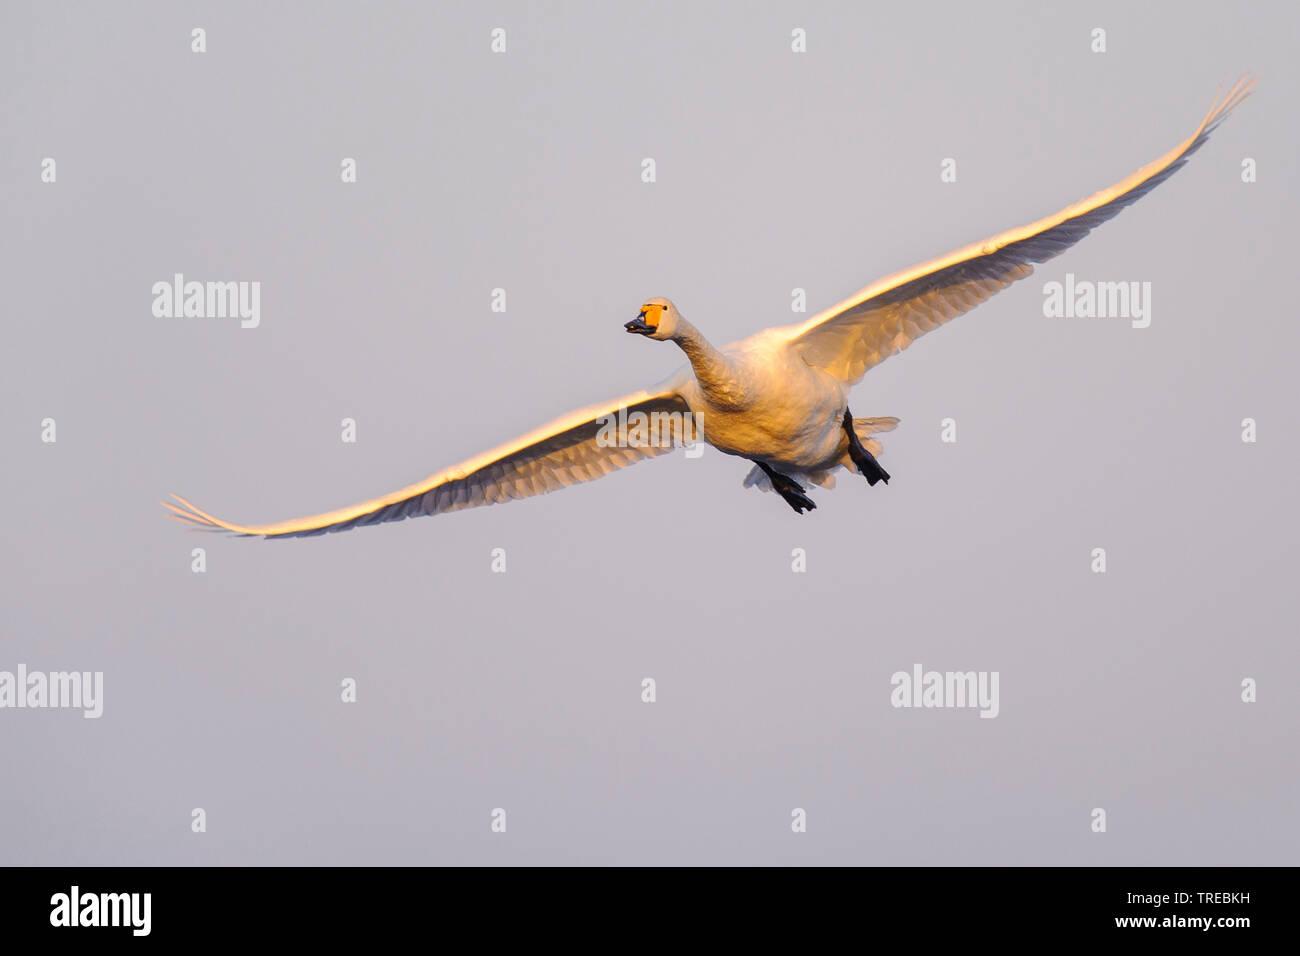 Singschwan, Sing-Schwan (Cygnus cygnus), im Flug, Deutschland, Niedersachsen | whooper swan (Cygnus cygnus), in flight, Germany, Lower Saxony | BLWS52 - Stock Image